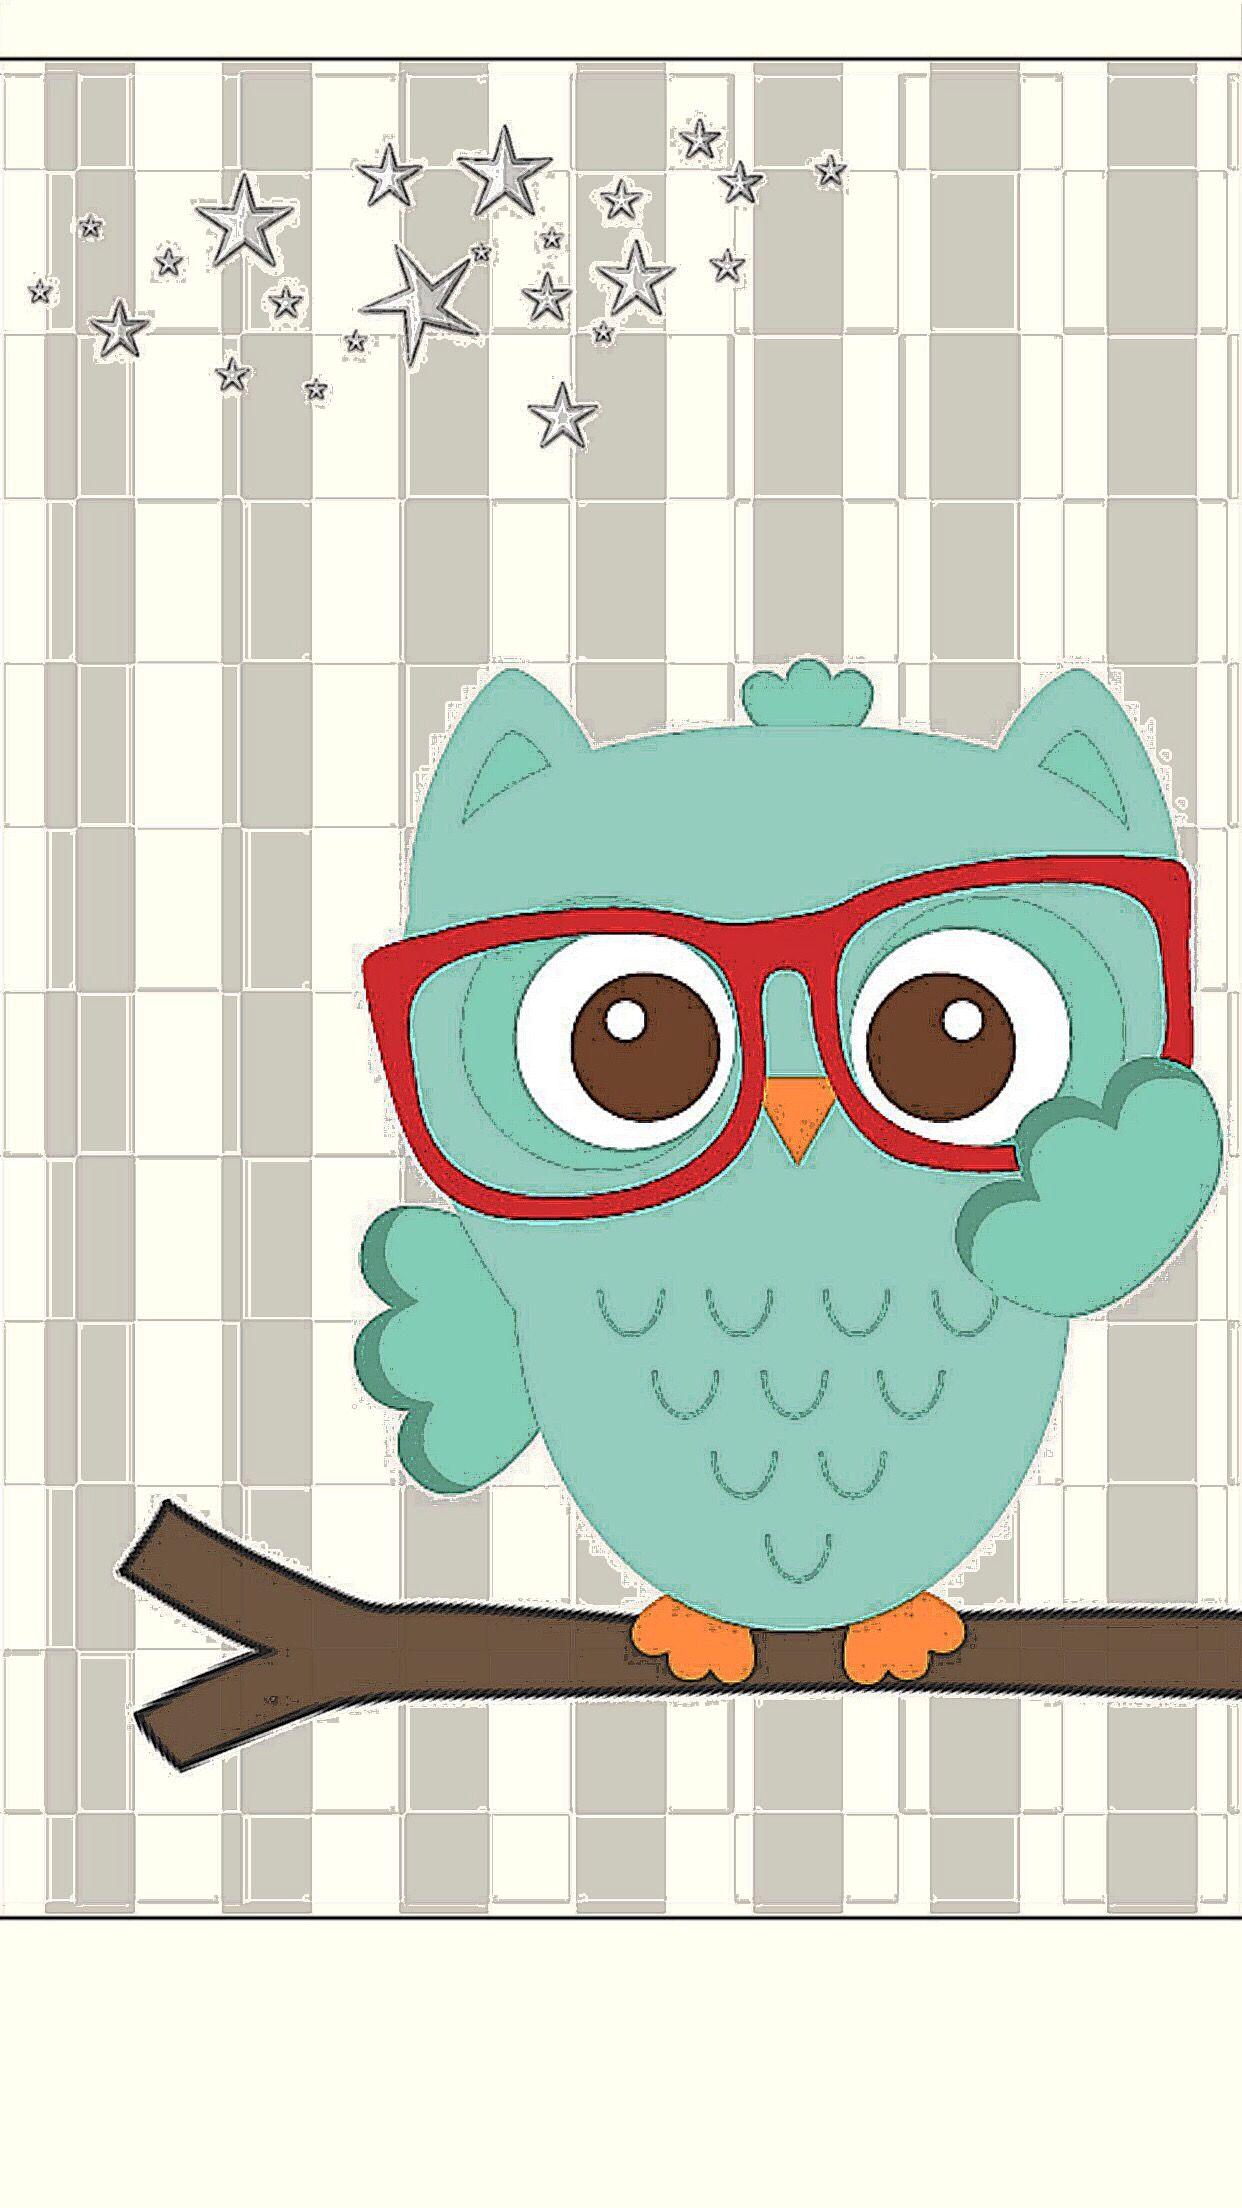 Pin By Hattie On Iphone Wallpaper Cute Owls Wallpaper Owl Wallpaper Owl Wallpaper Iphone